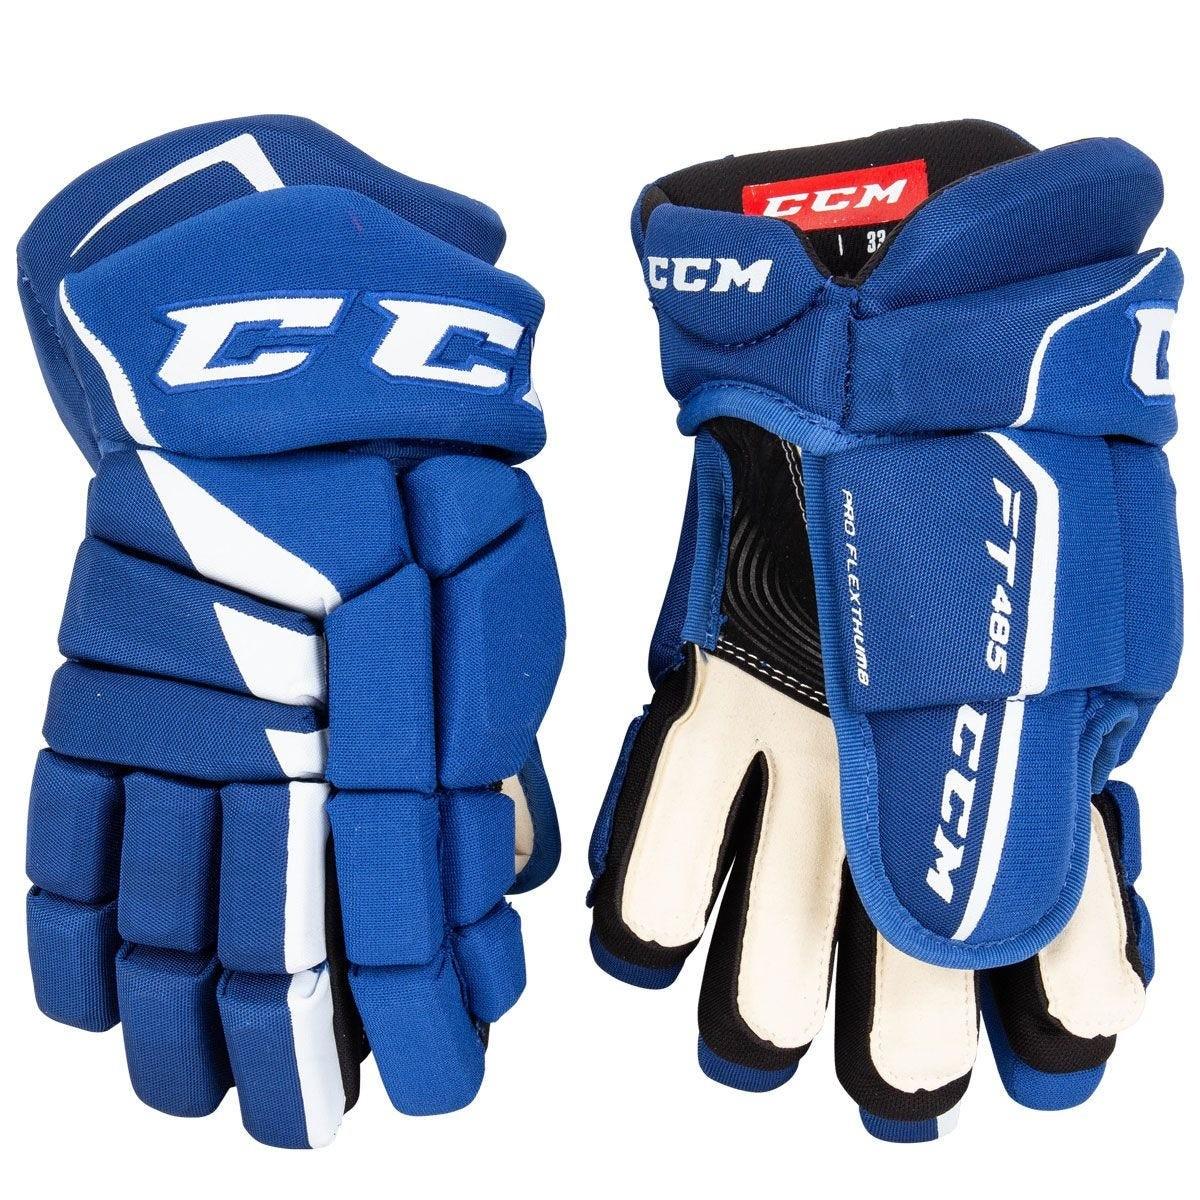 CCM Jetspeed FT485 Senior Ice Hockey Gloves